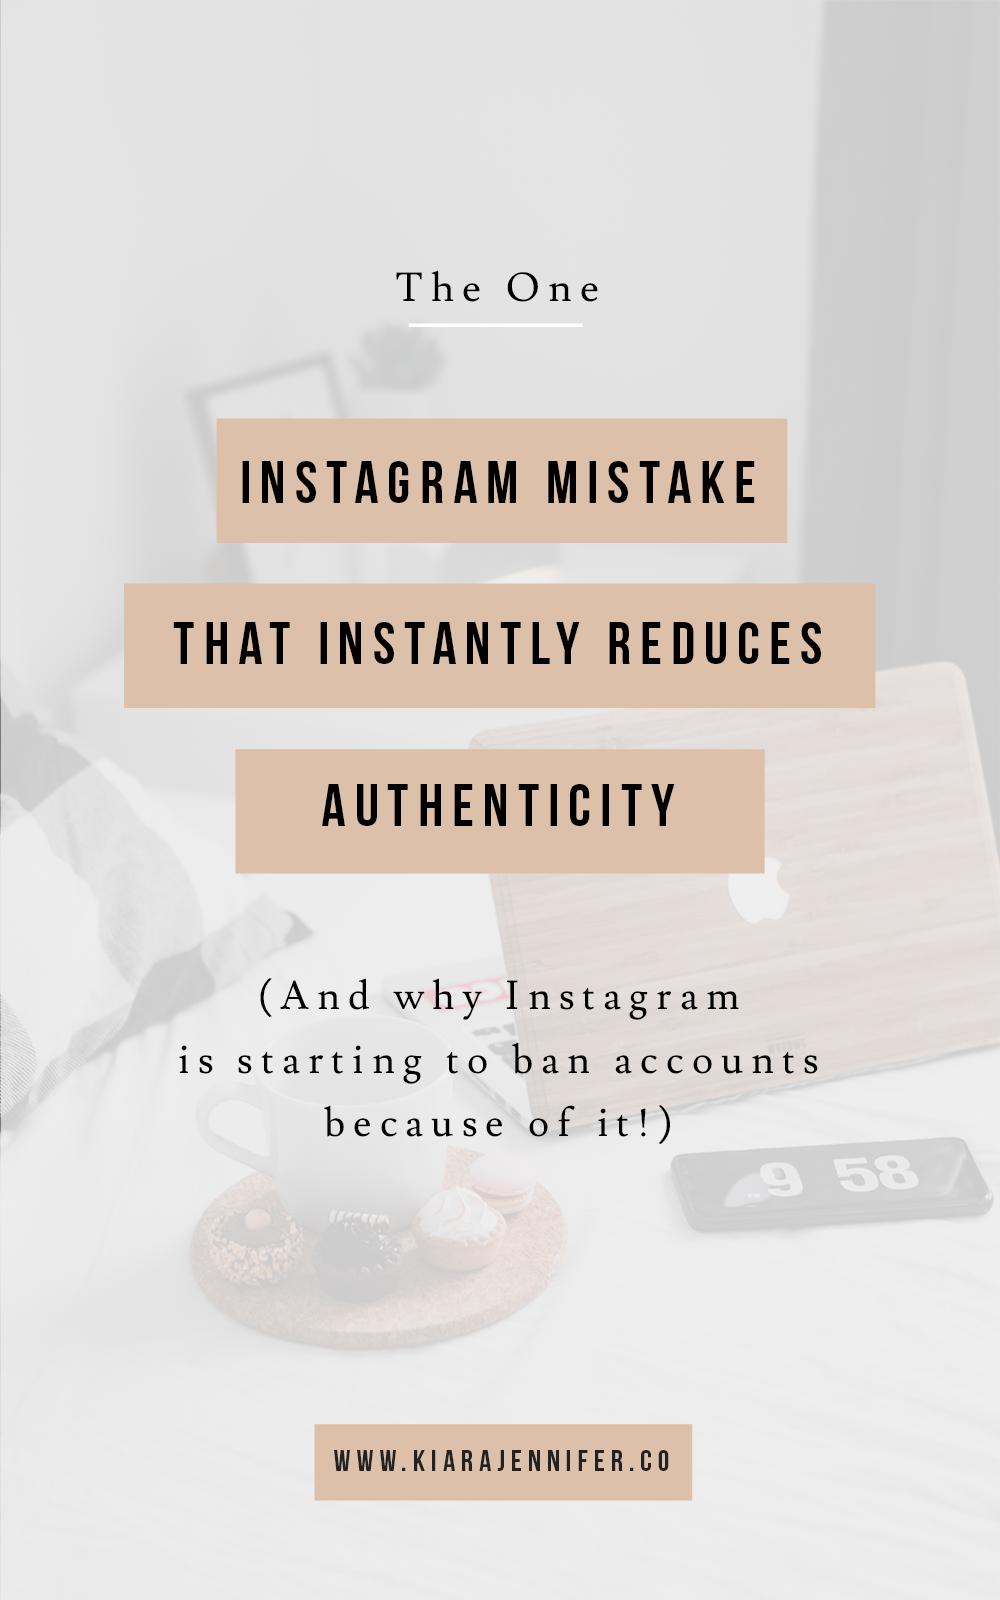 Choose Organic Marketing Strategies on Instagram | Social Media Marketing | Instagram Marketing for Business | Kiara Jennifer and Co | Digital Public Relations